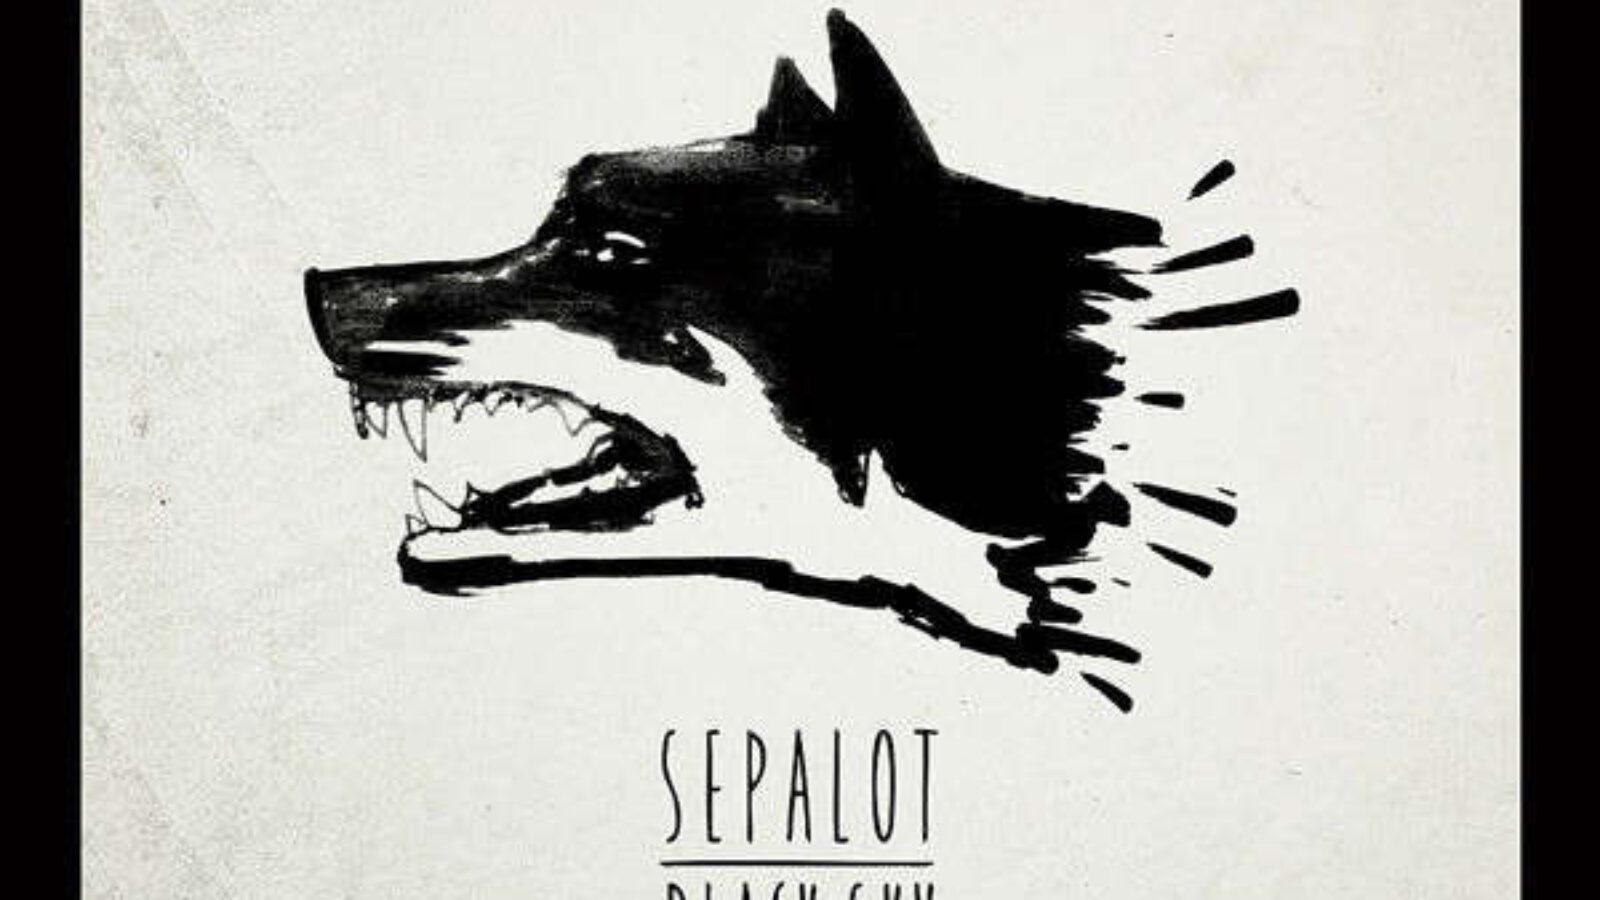 SEPALOT Black Sky